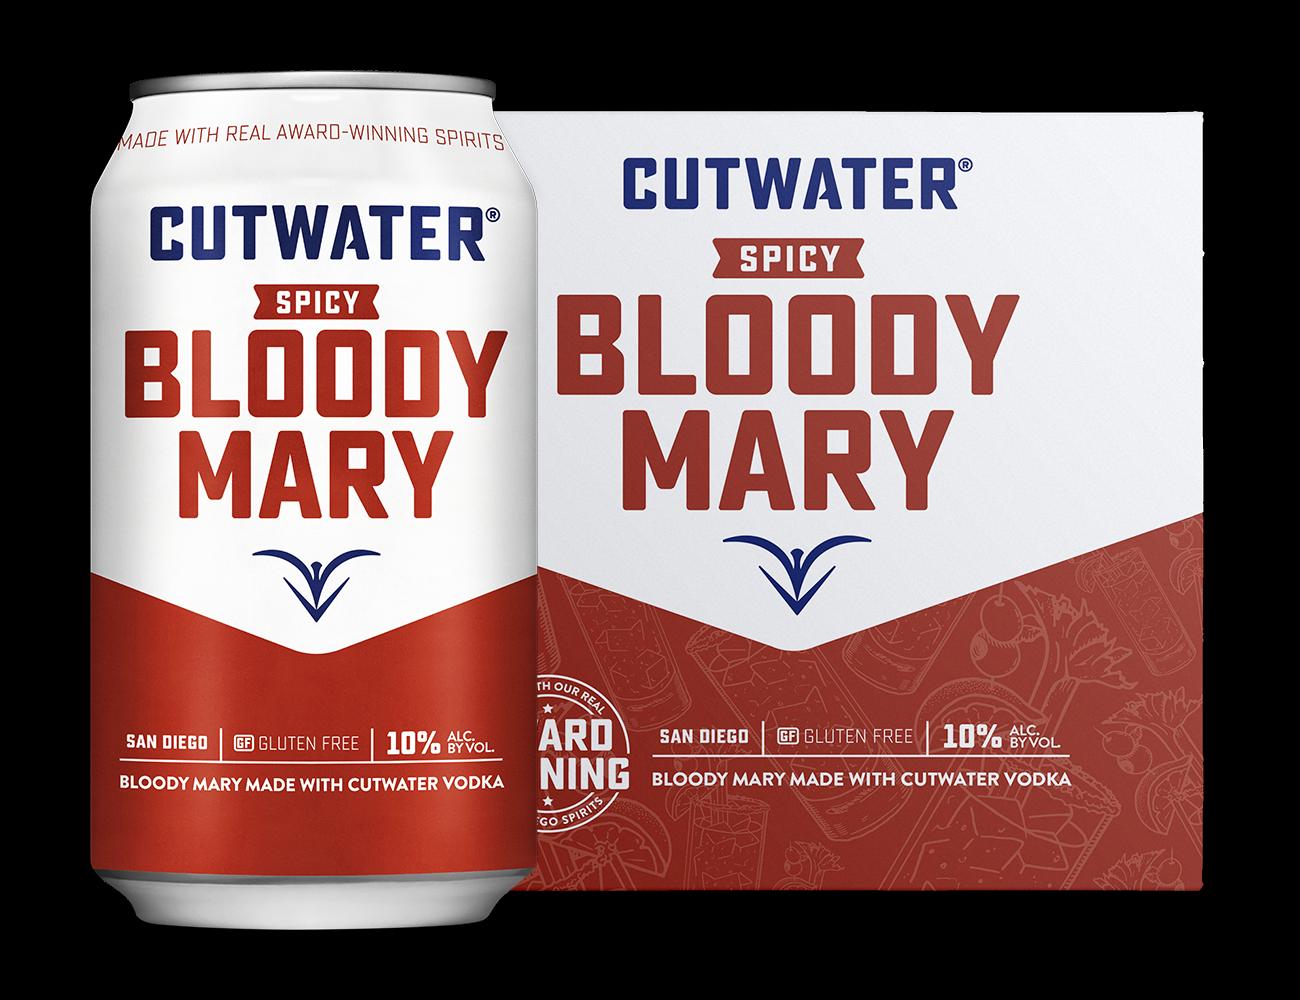 CUTWATER VODKA MILD BLOODY MARY